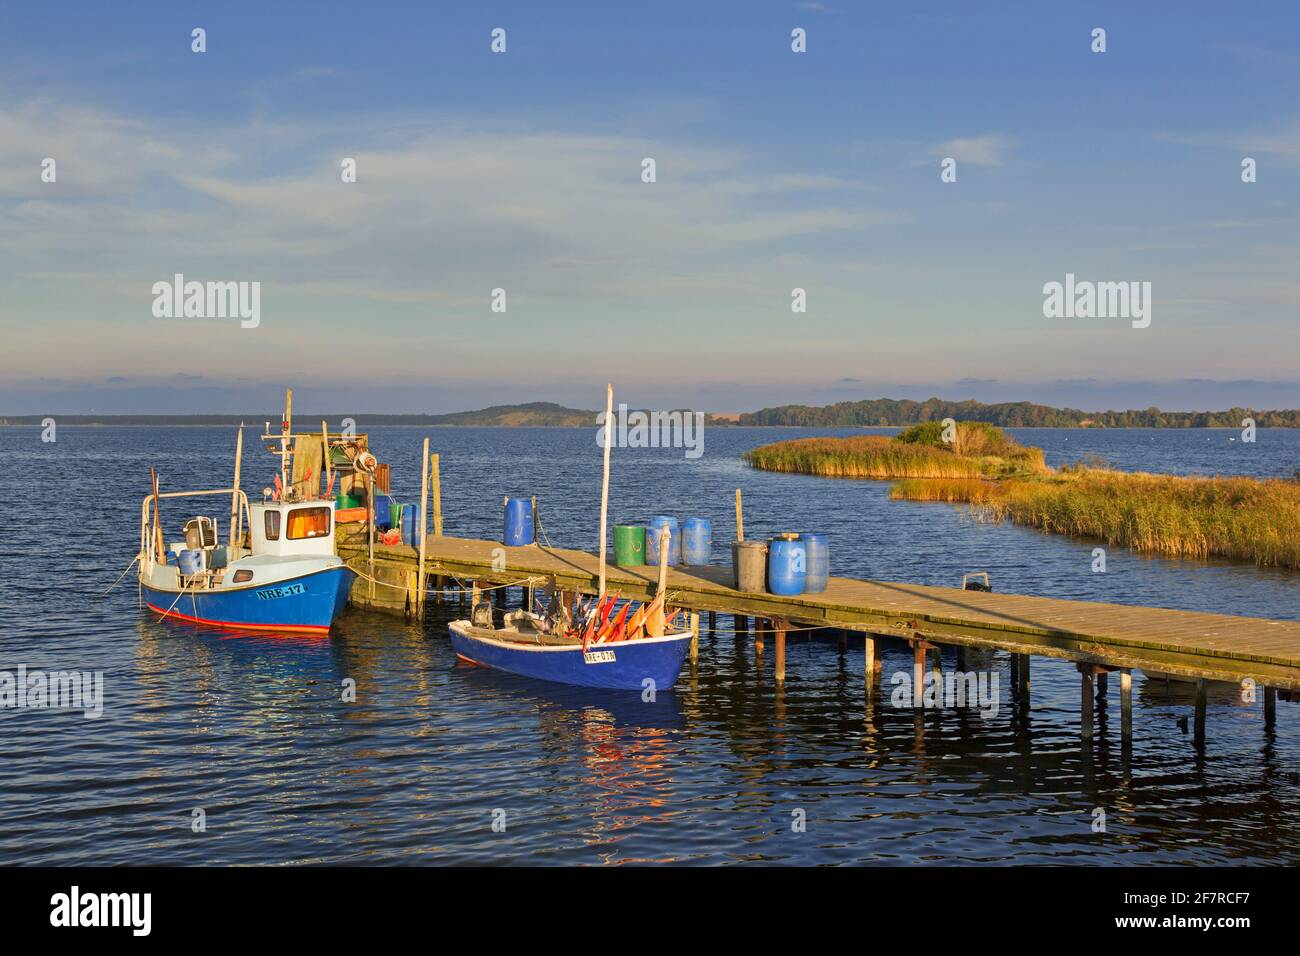 Fishing boats moored along wooden jetty at Neu Reddevitz, Lancken-Granitz on the island Rügen / Ruegen, Mecklenburg Western Pomerania, Germany Stock Photo